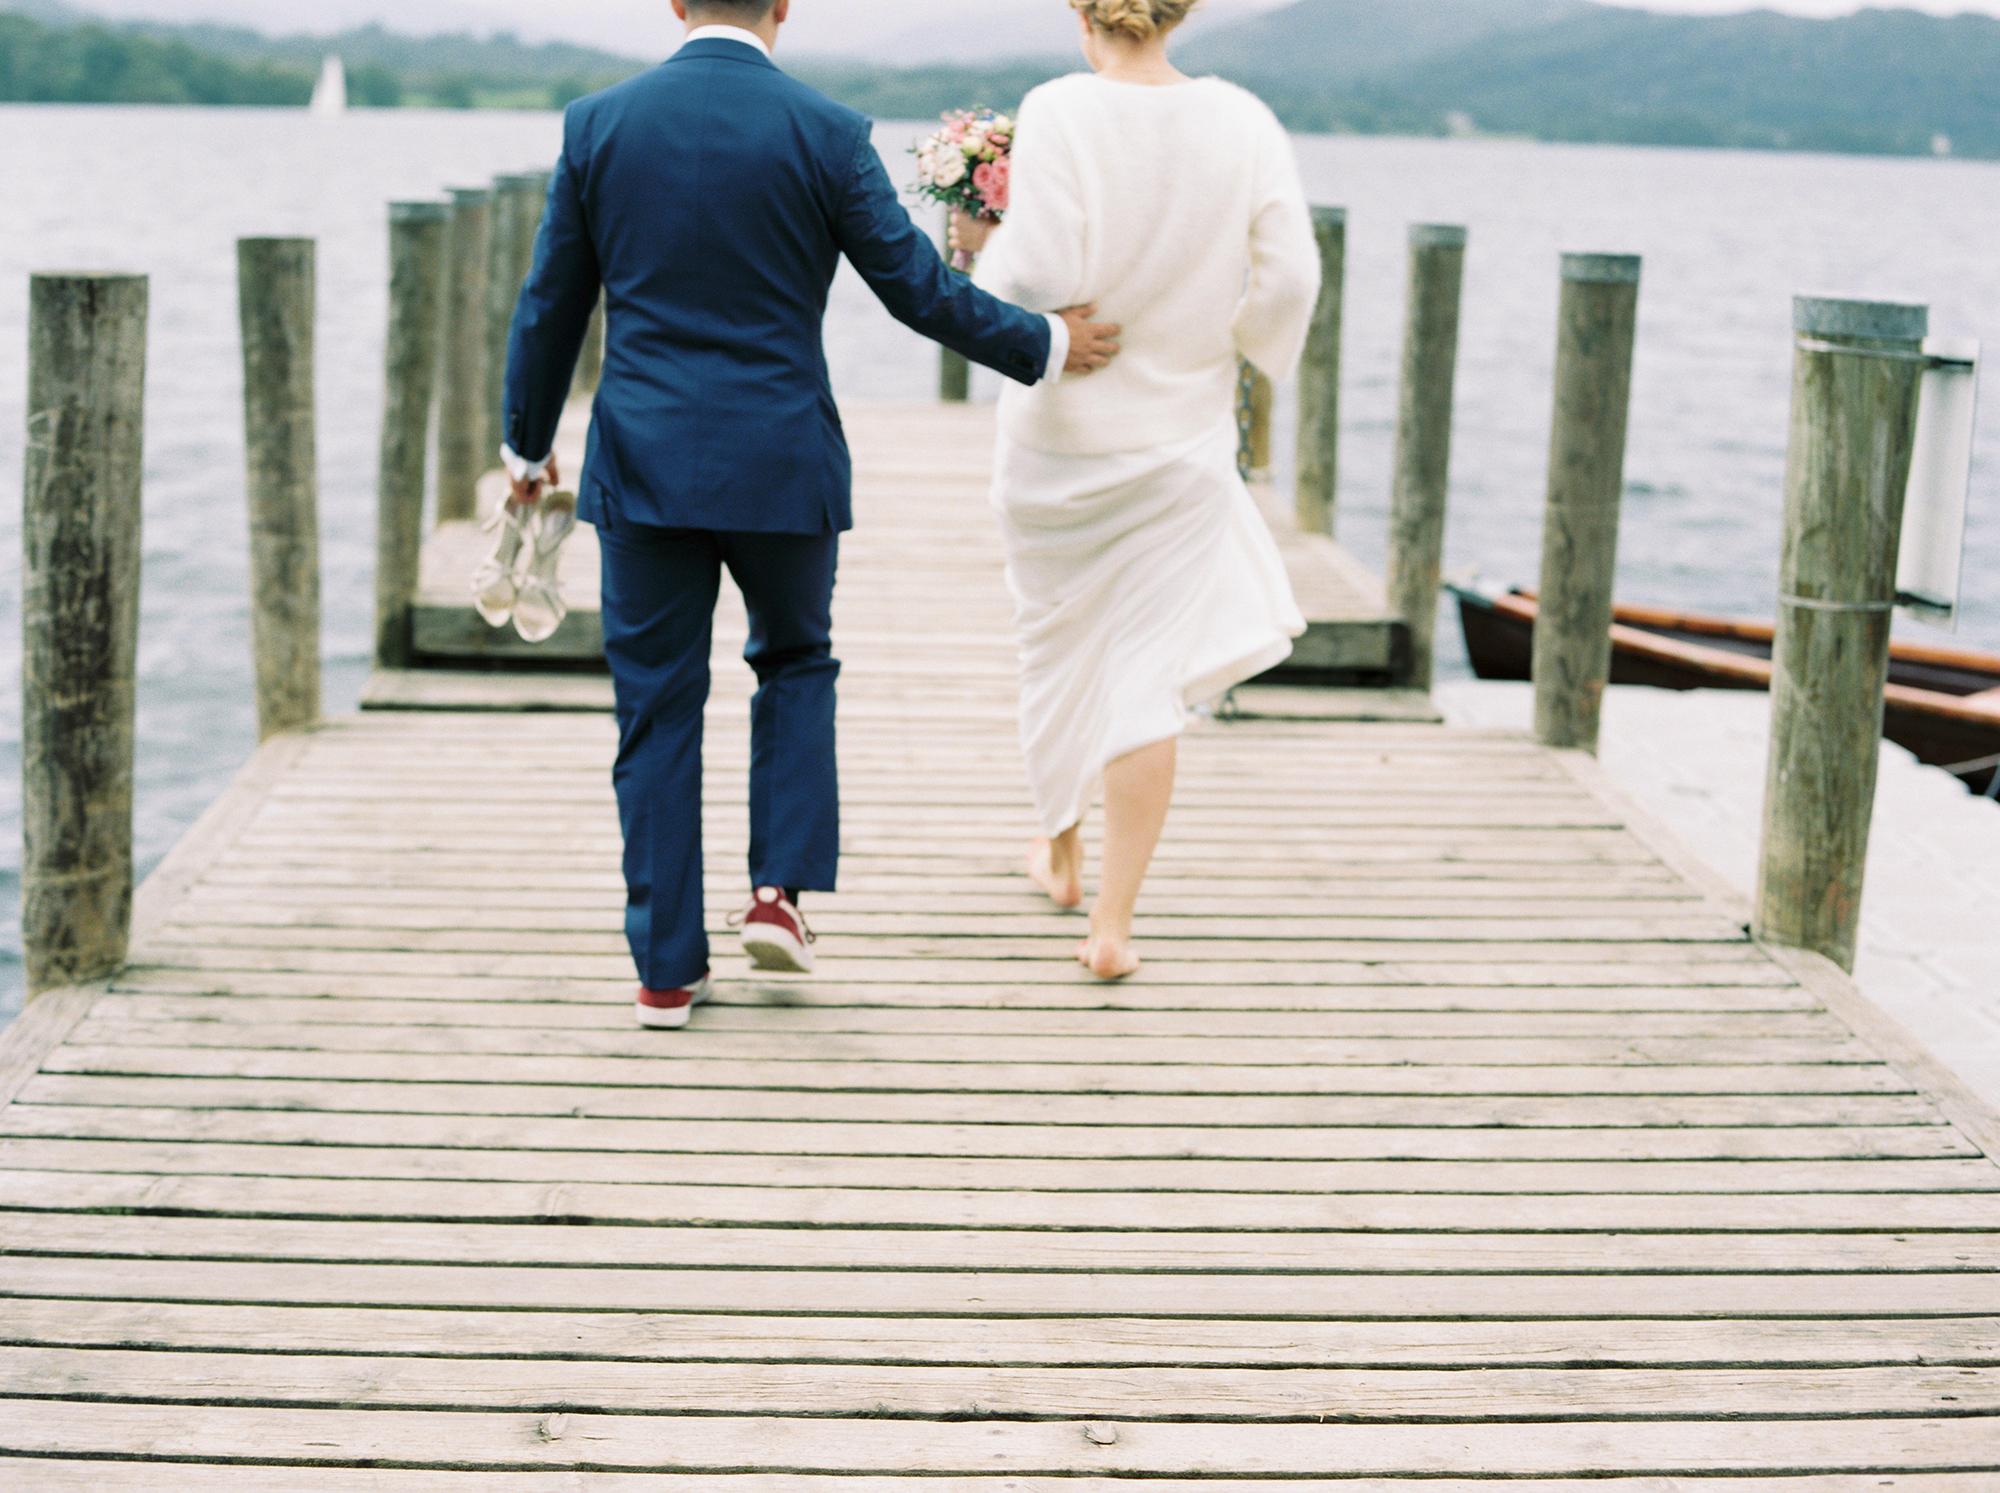 wedding_photographer_cumbria164.jpg